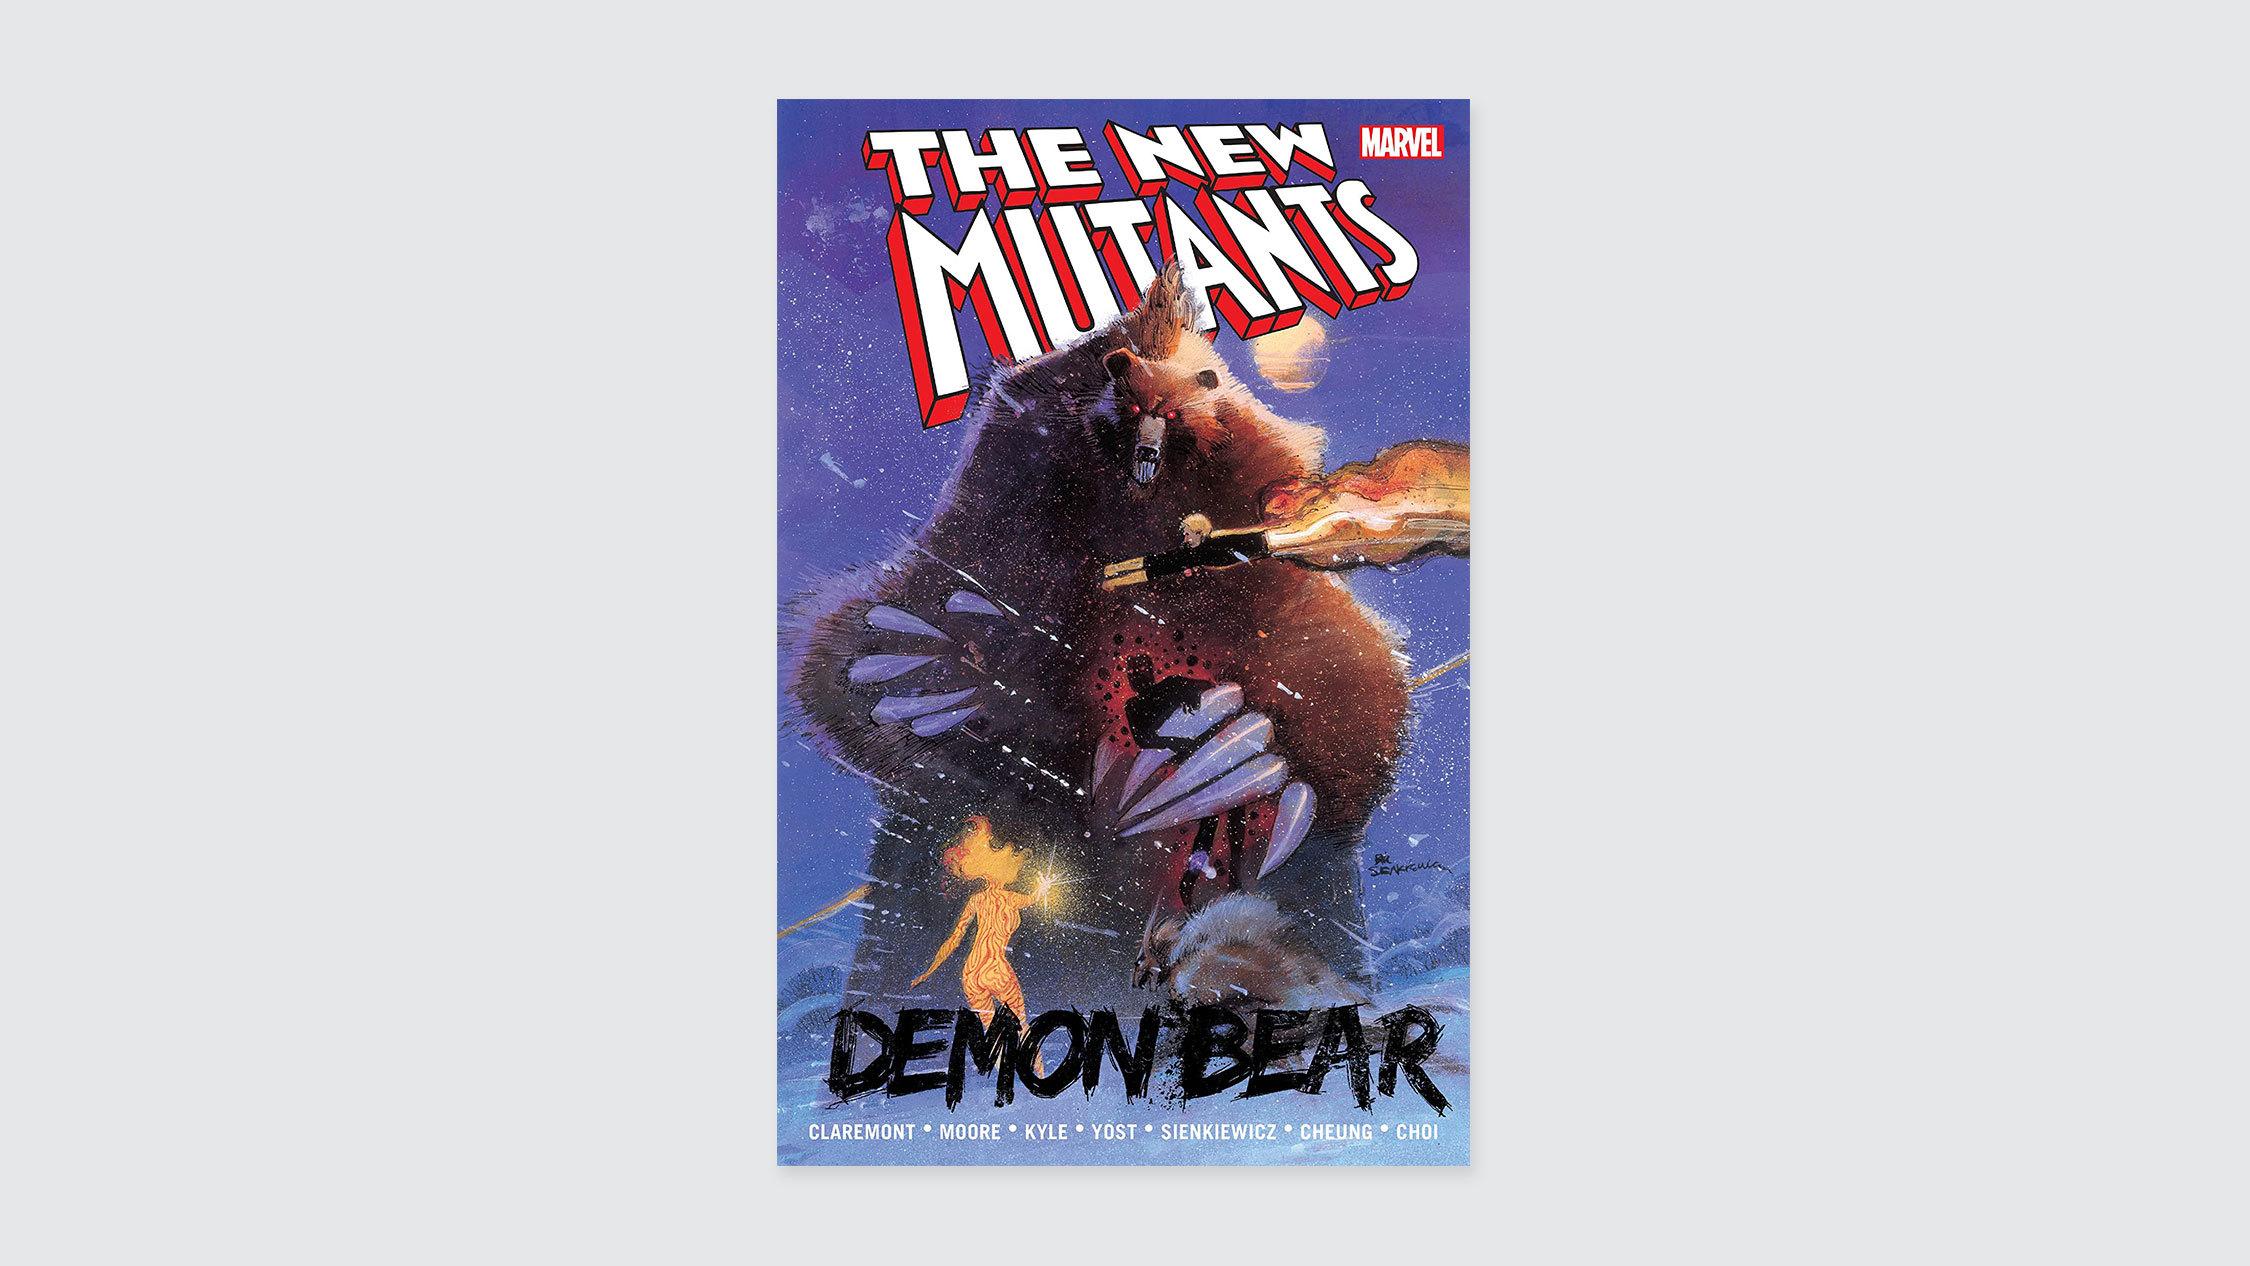 The New Mutants: Demon Bear comics